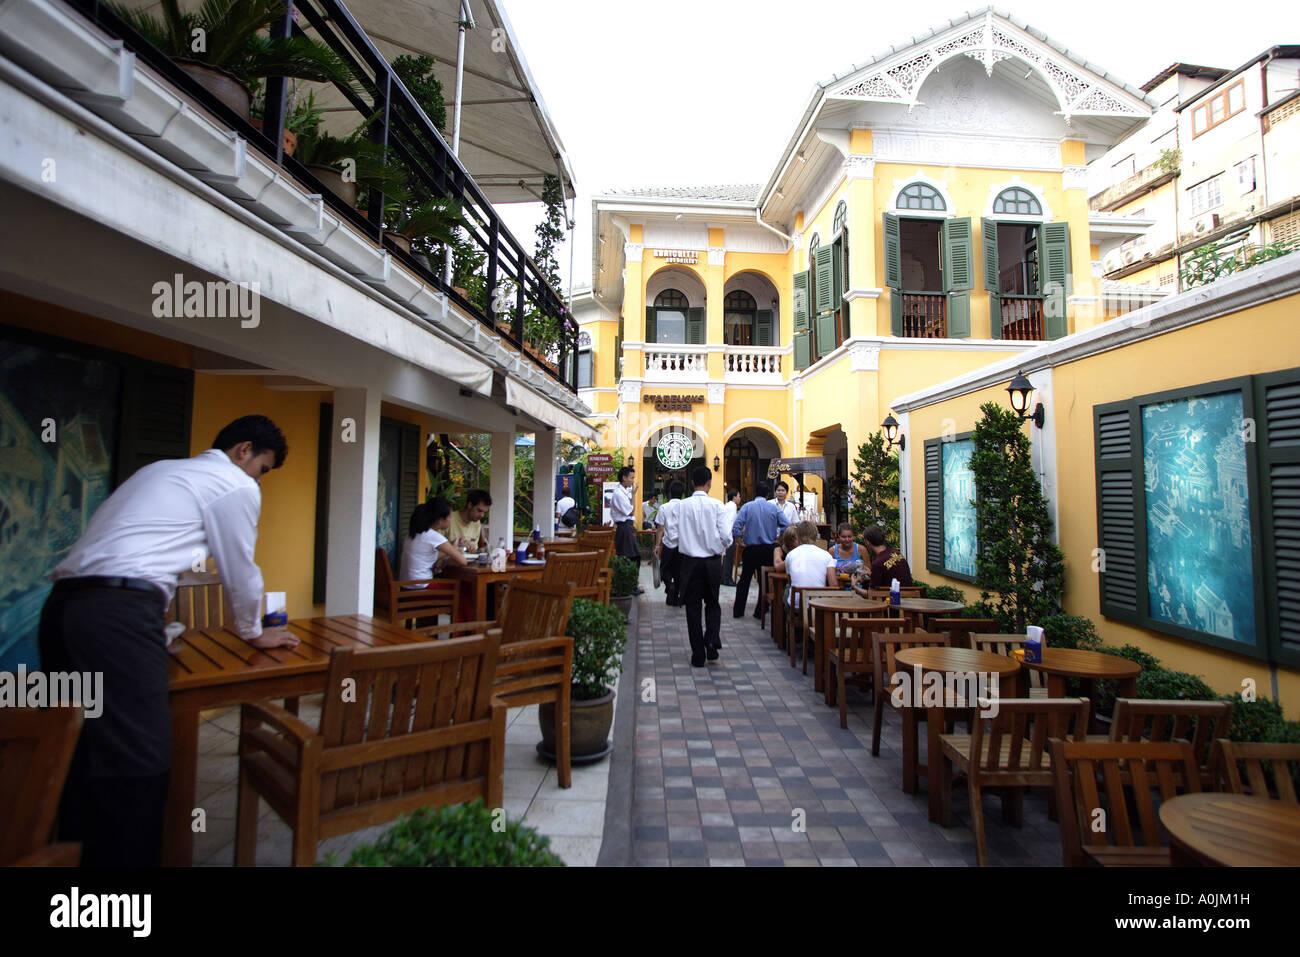 New stylish hotels and bars in Khao San Road area of Bangkok ...